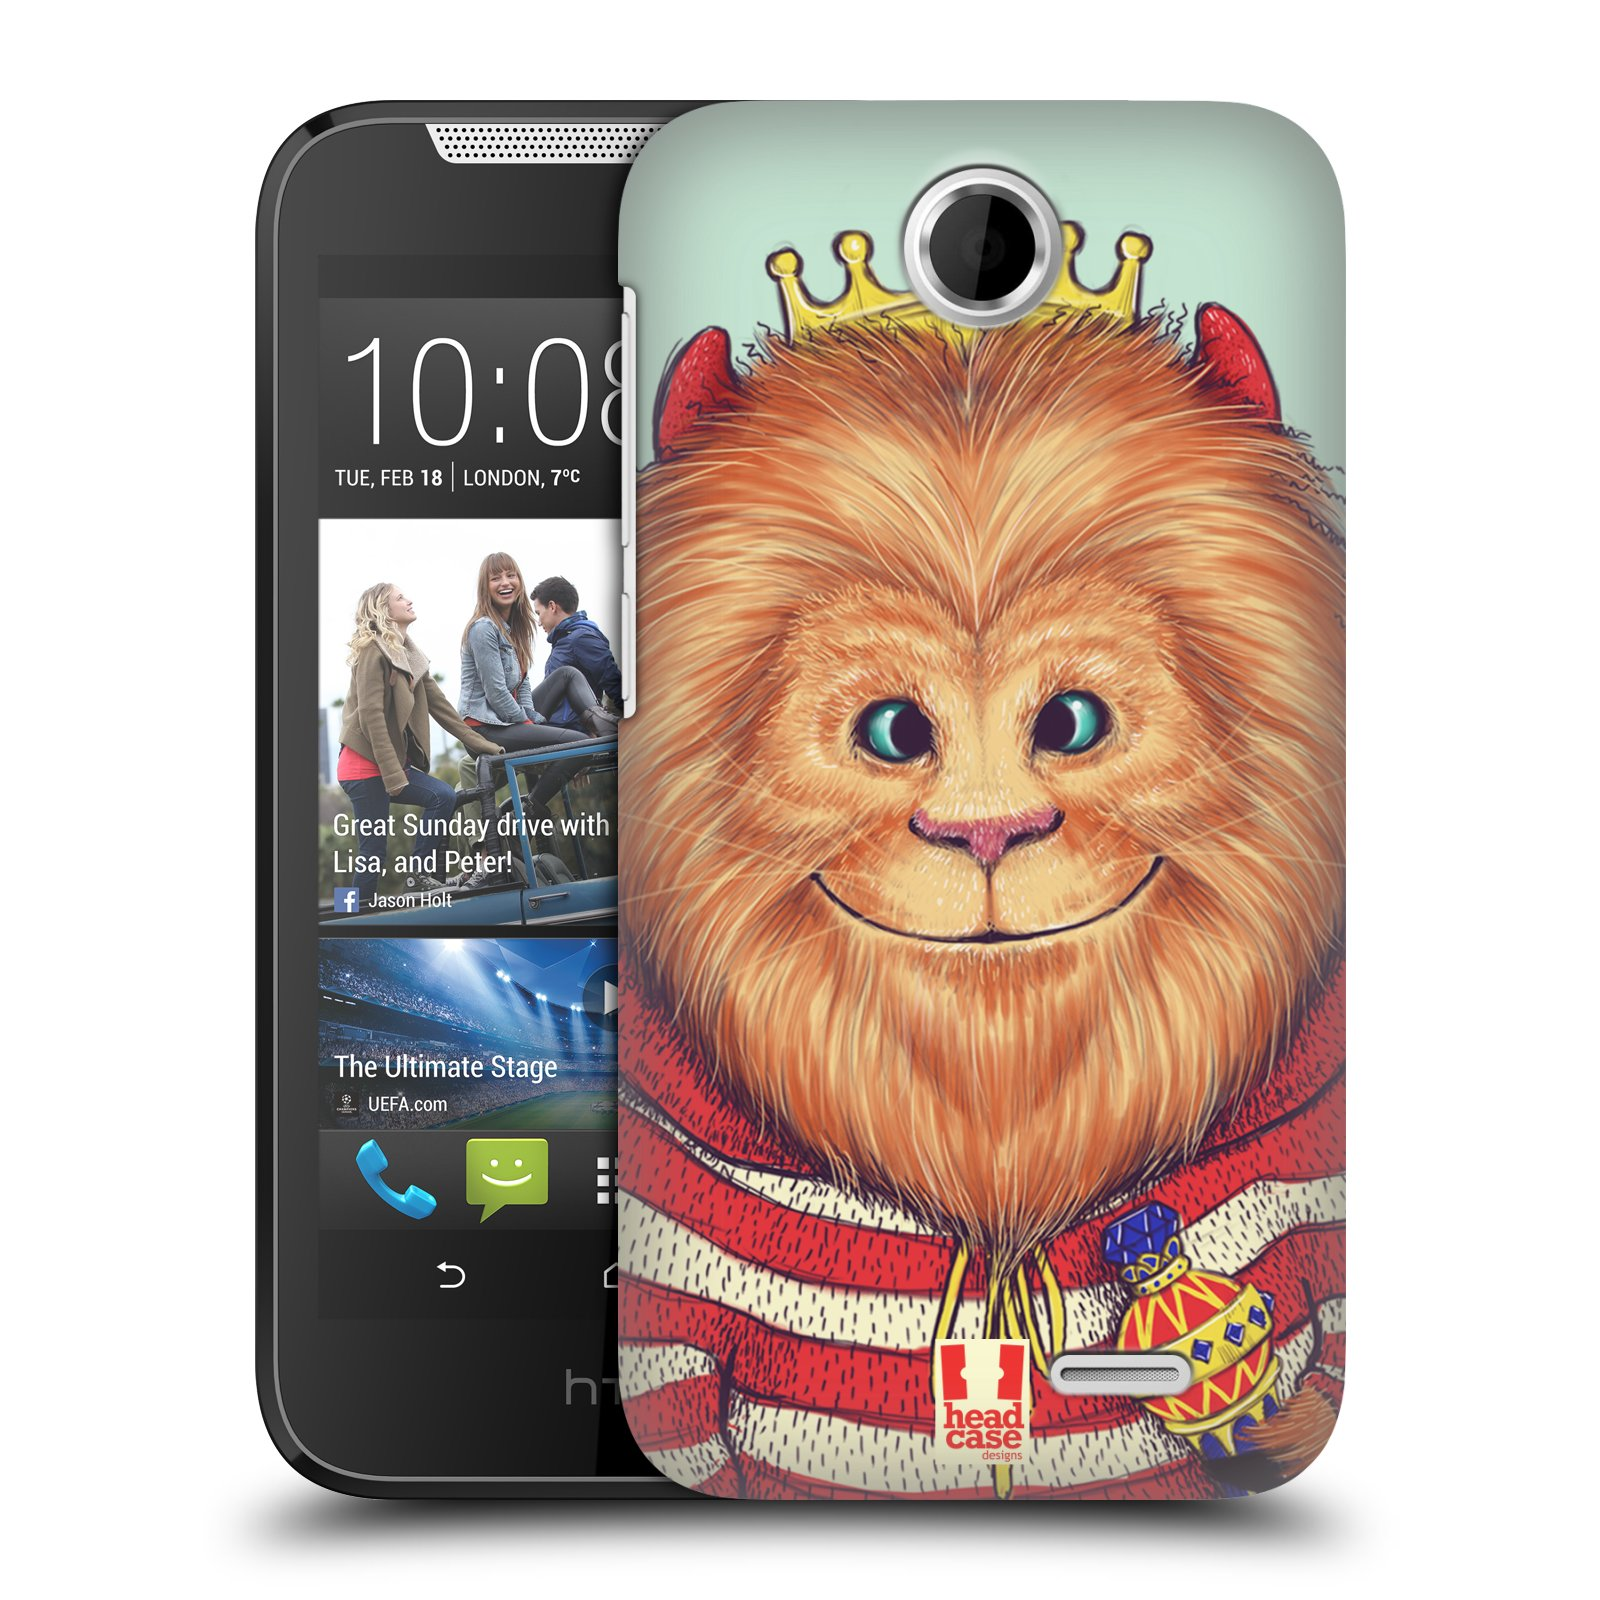 HEAD CASE plastový obal na mobil HTC Desire 310 vzor Kreslená zvířátka lev